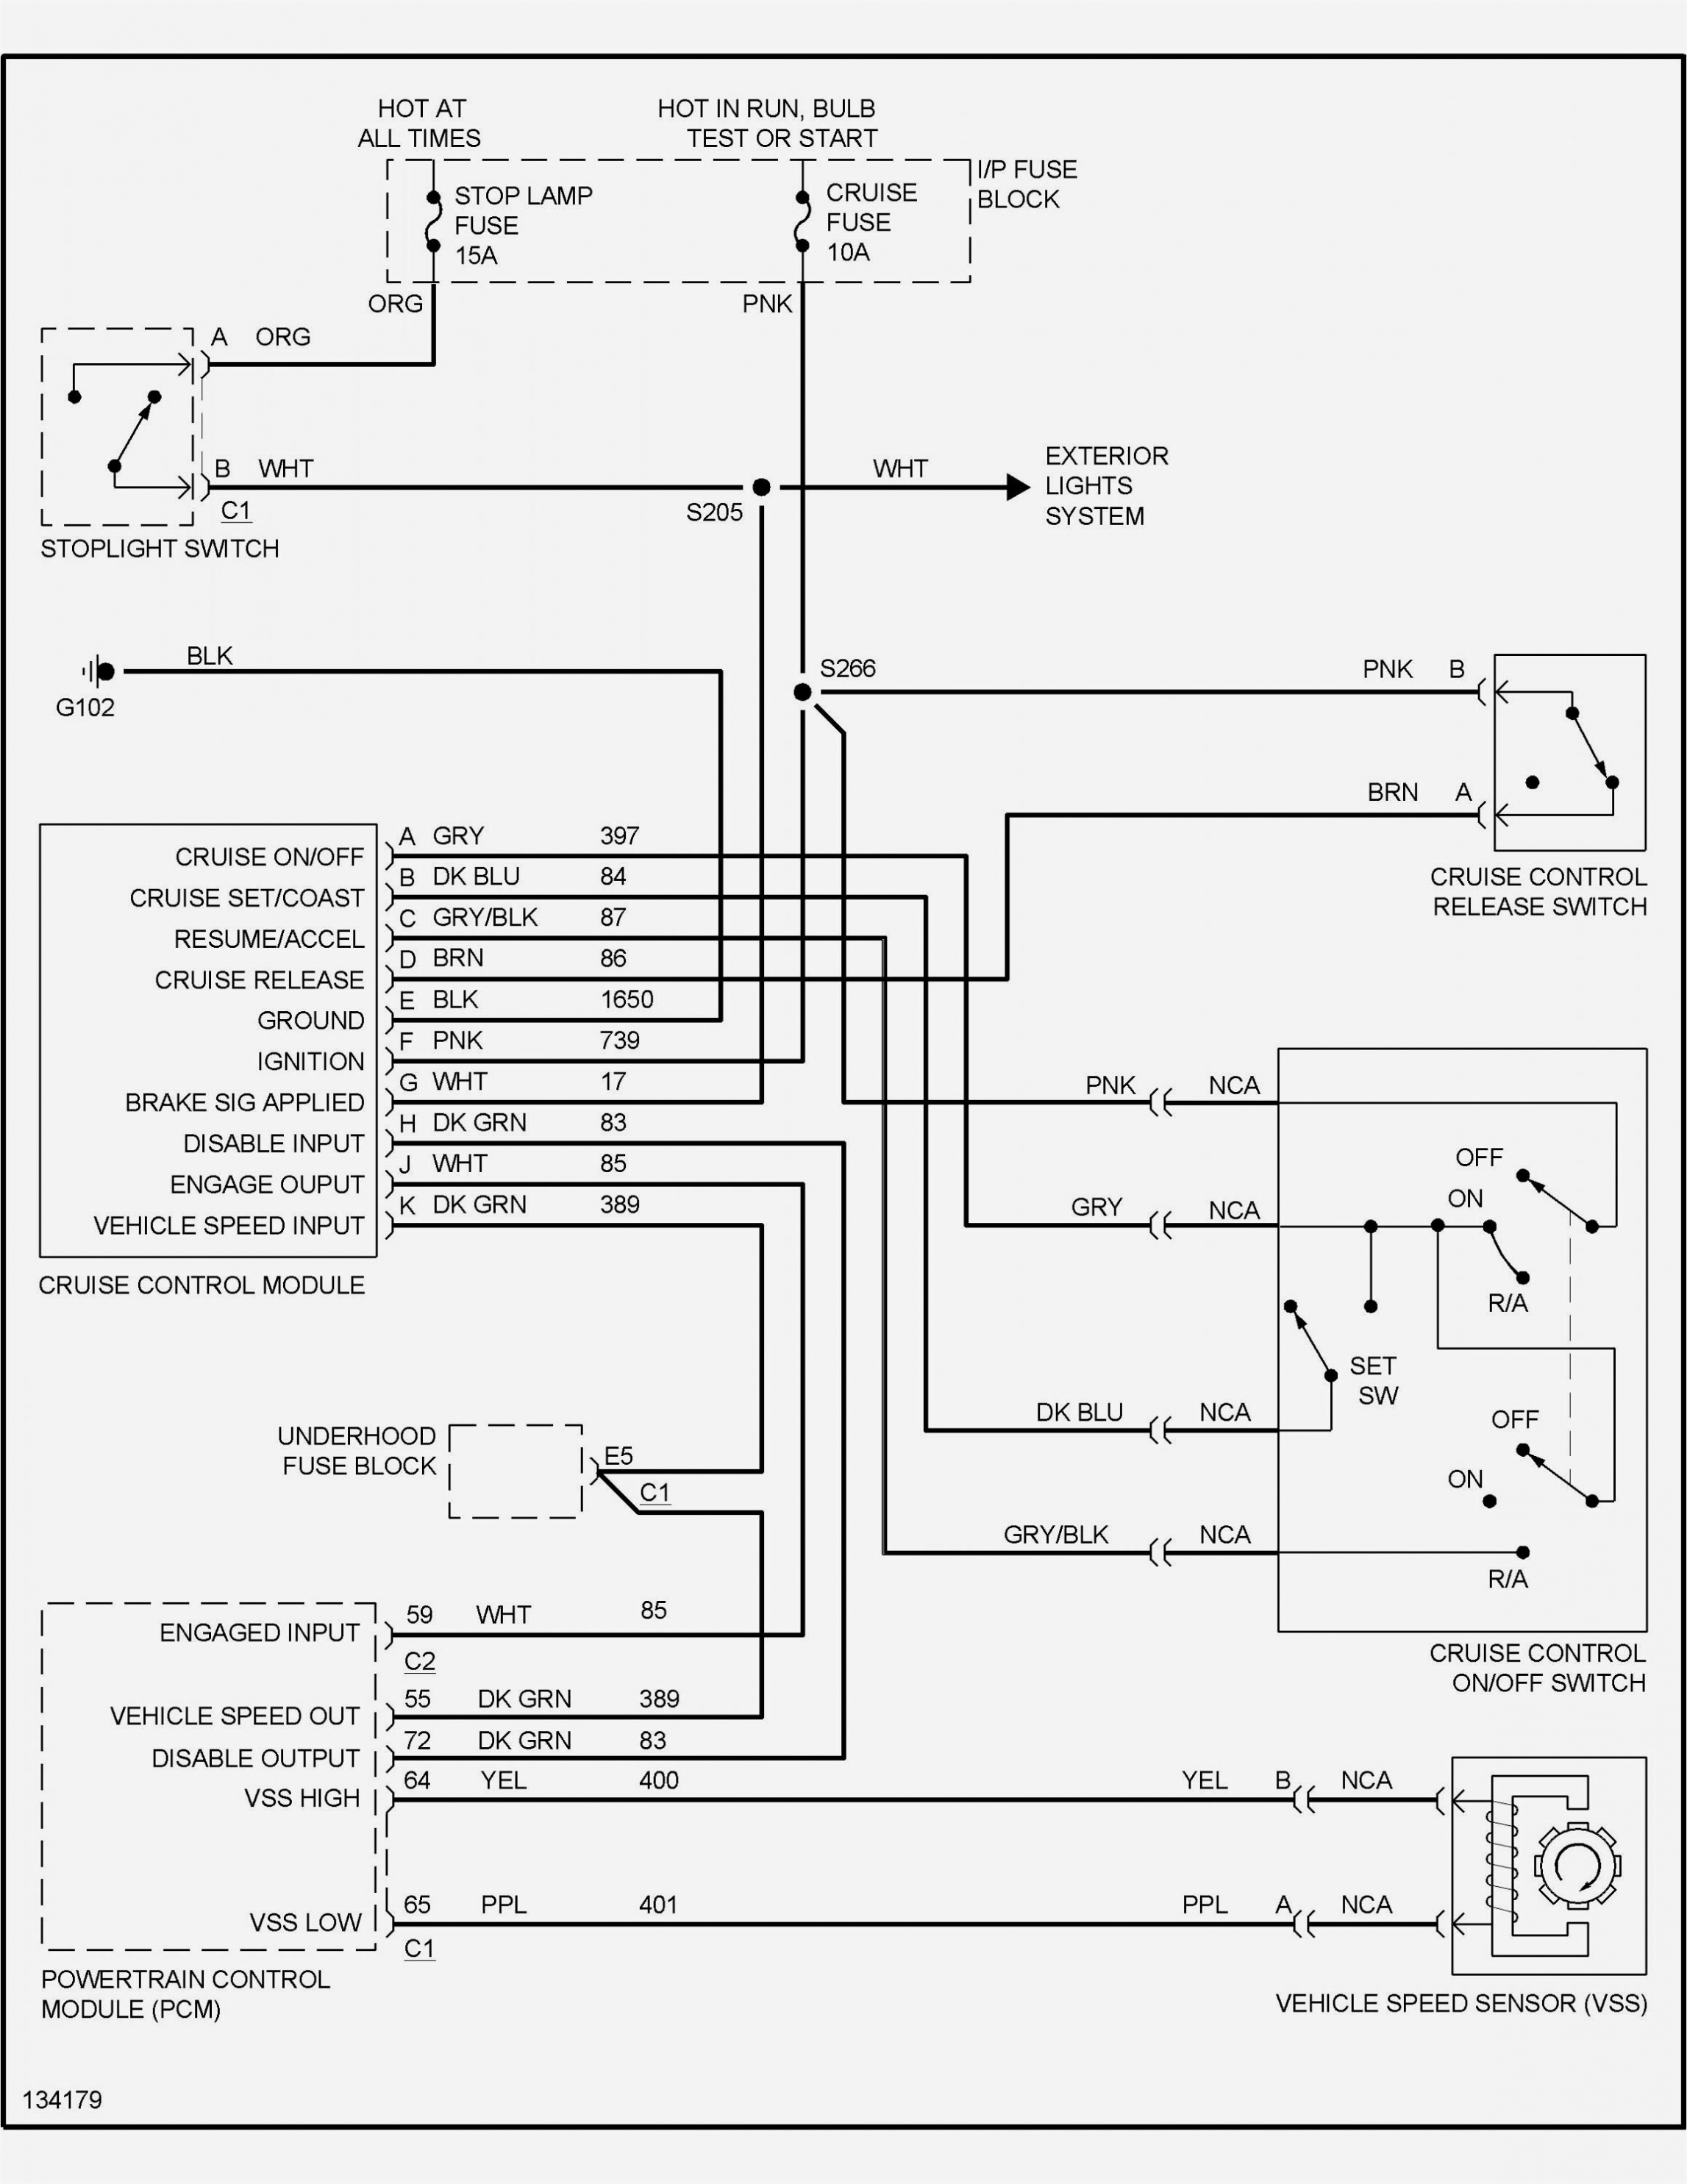 Sony Cdx Gt34W Wiring Schematics For Model | Wiring Diagram - Sony Explod Wiring Diagram